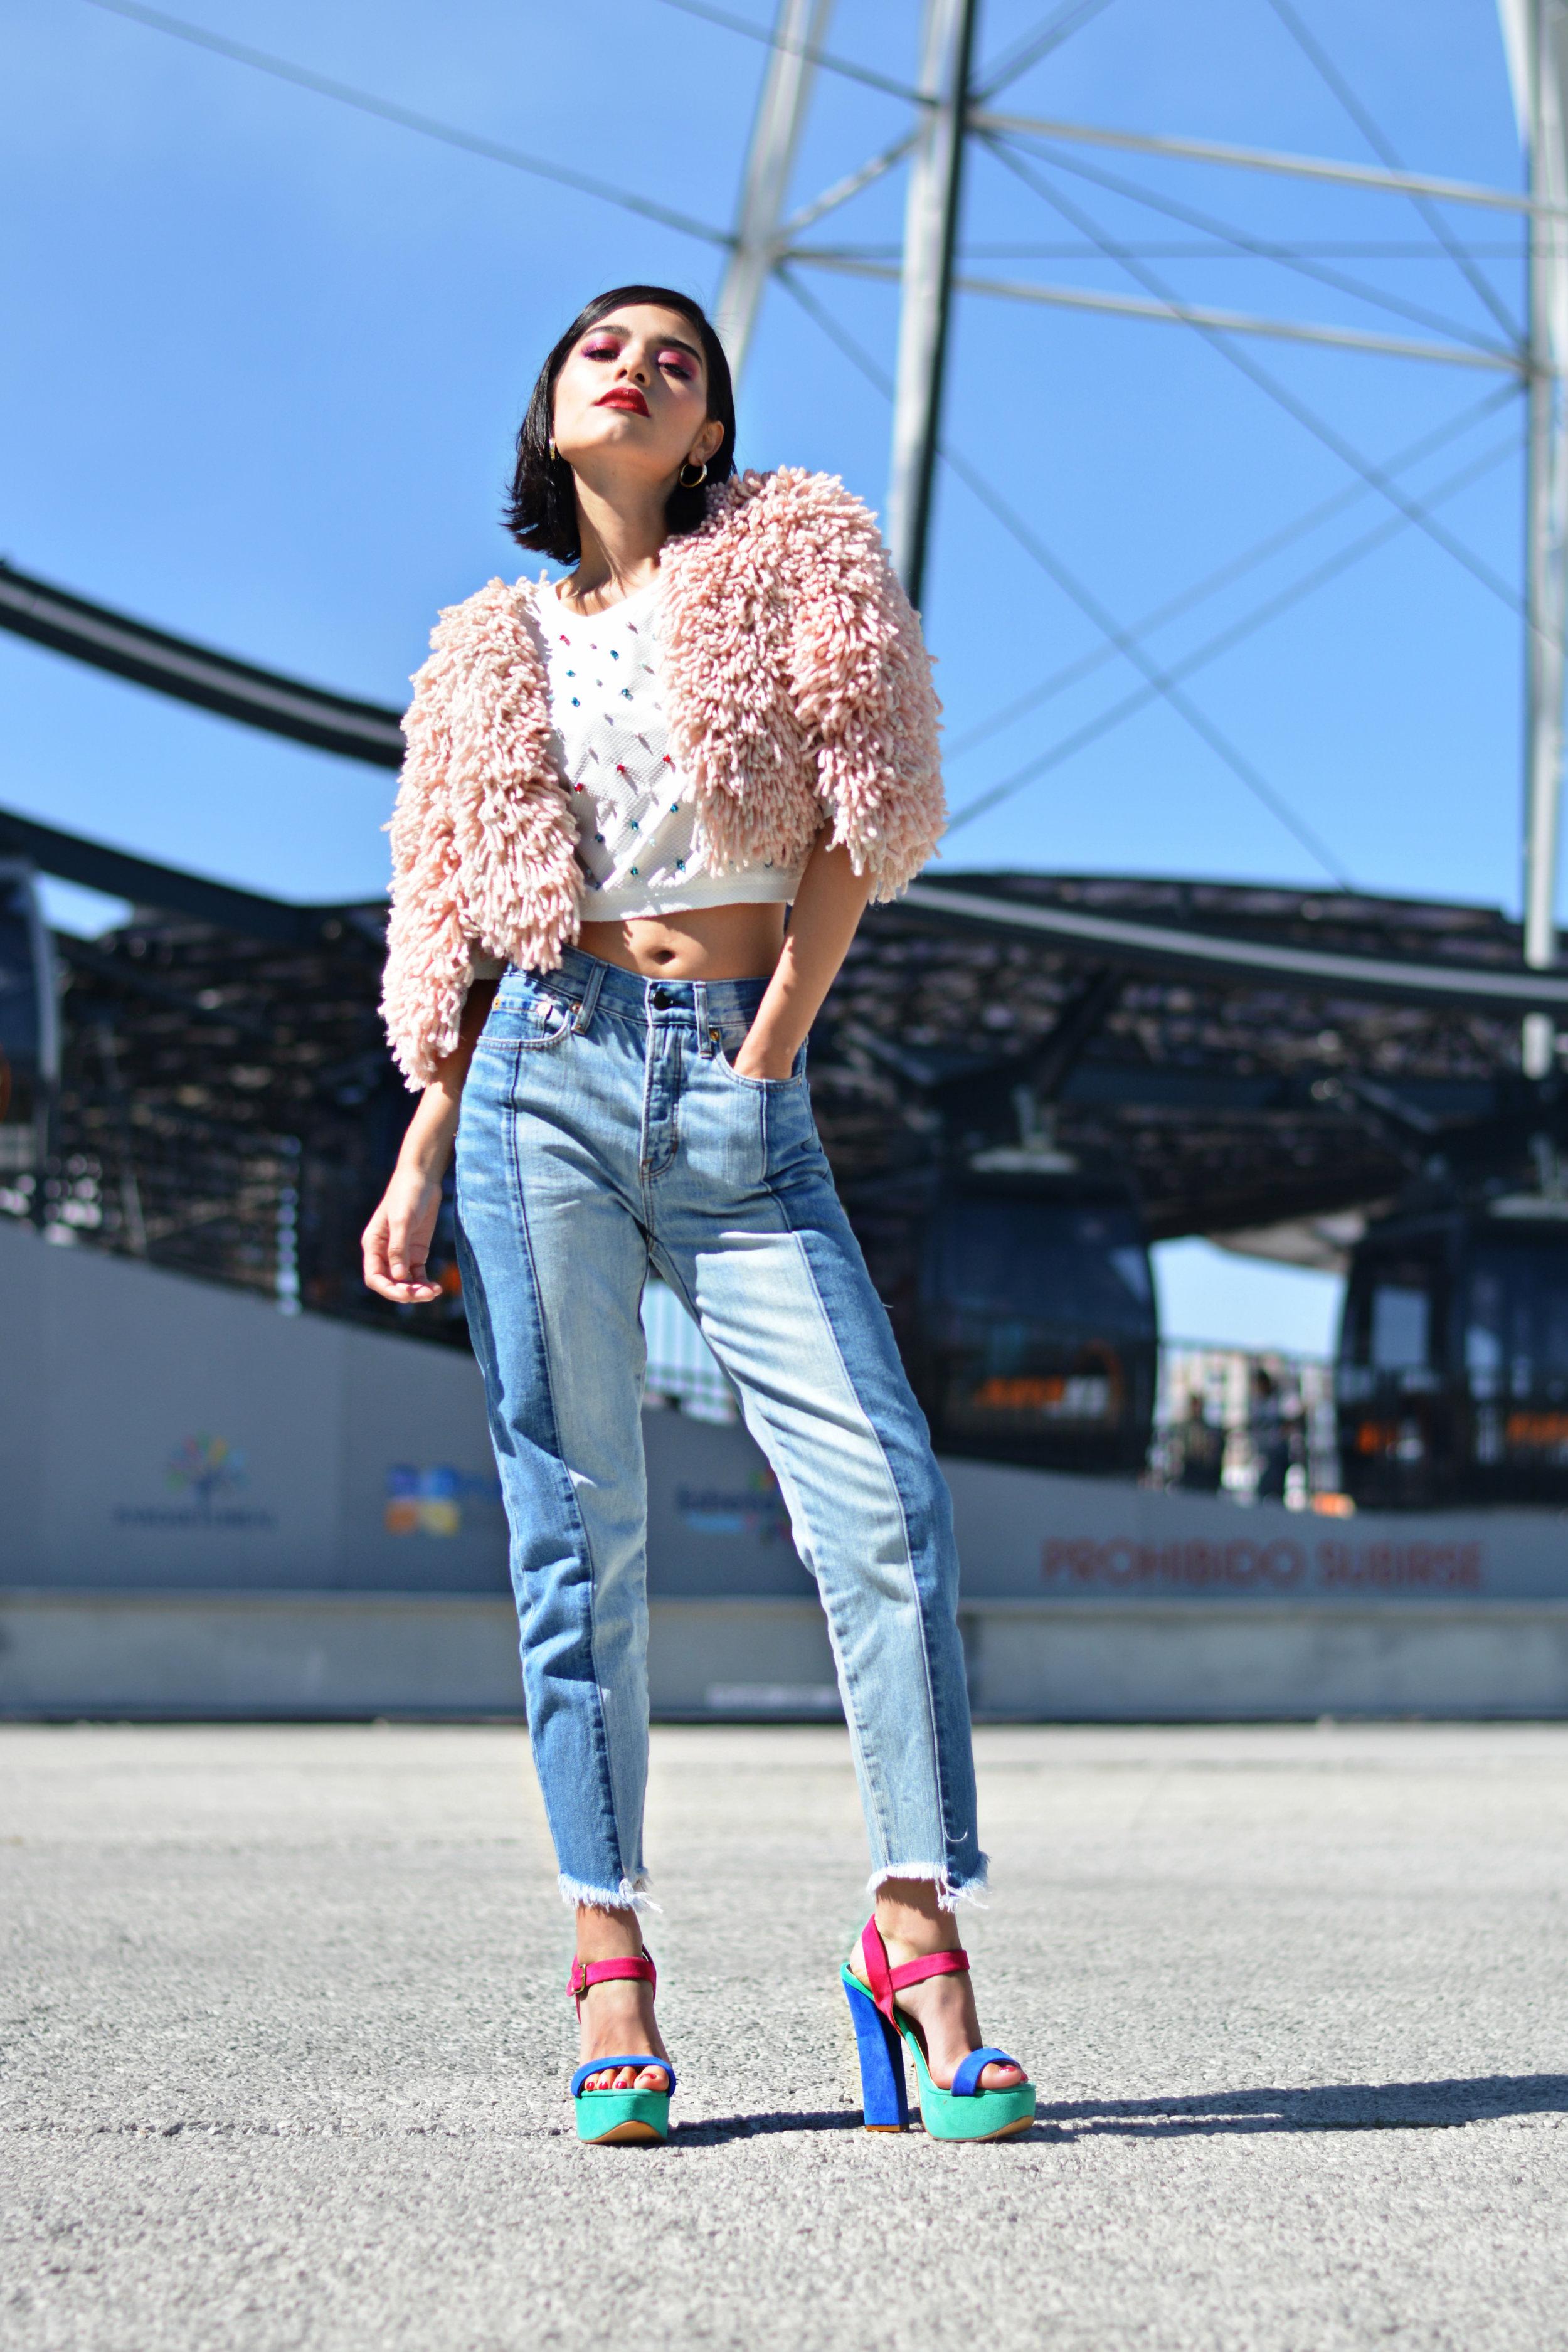 Total Look  Fur Coat: Regina Polin  Top: David Romero Brand  Jeans: American Eagle  Heels: Brantano